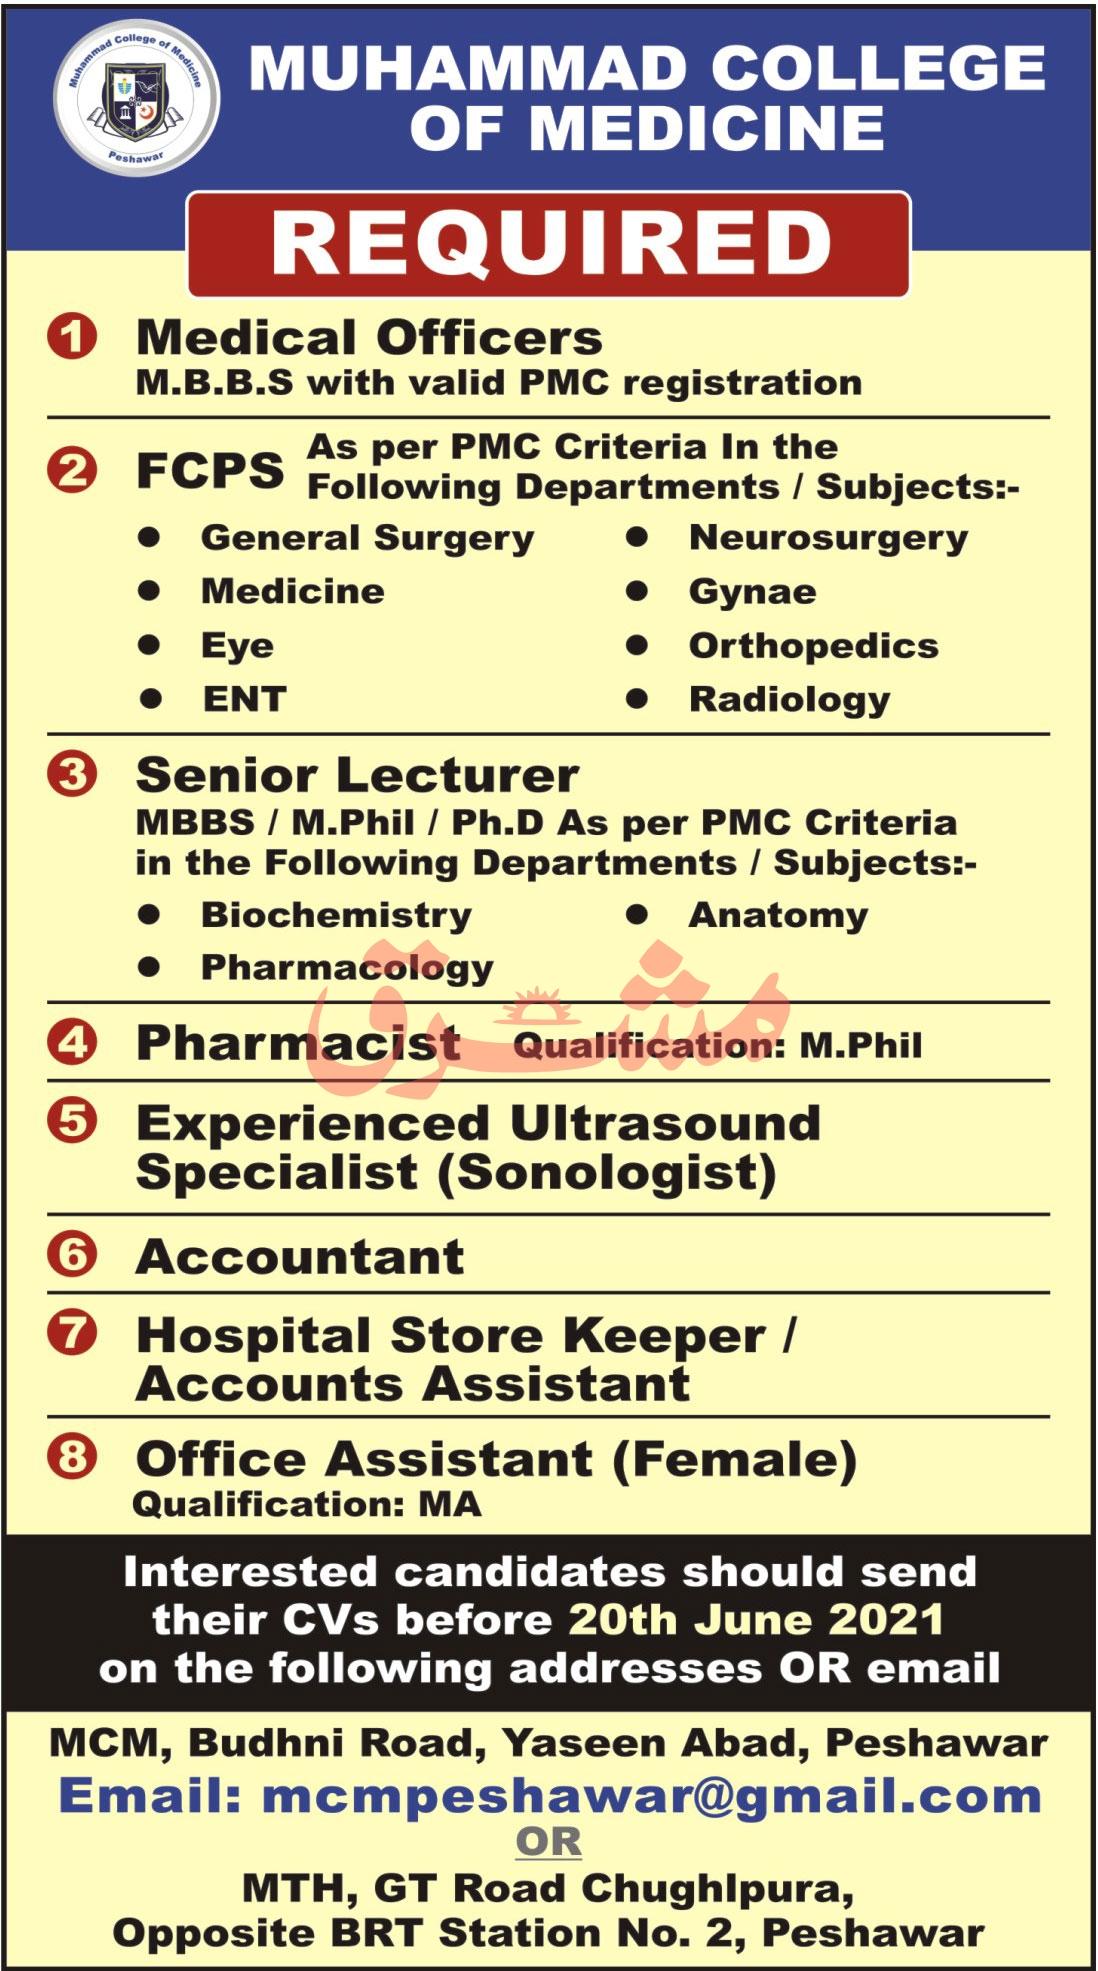 mcmpeshawar@gamil.com - Muhammad College Of Medicine Jobs 2021 in Pakistan